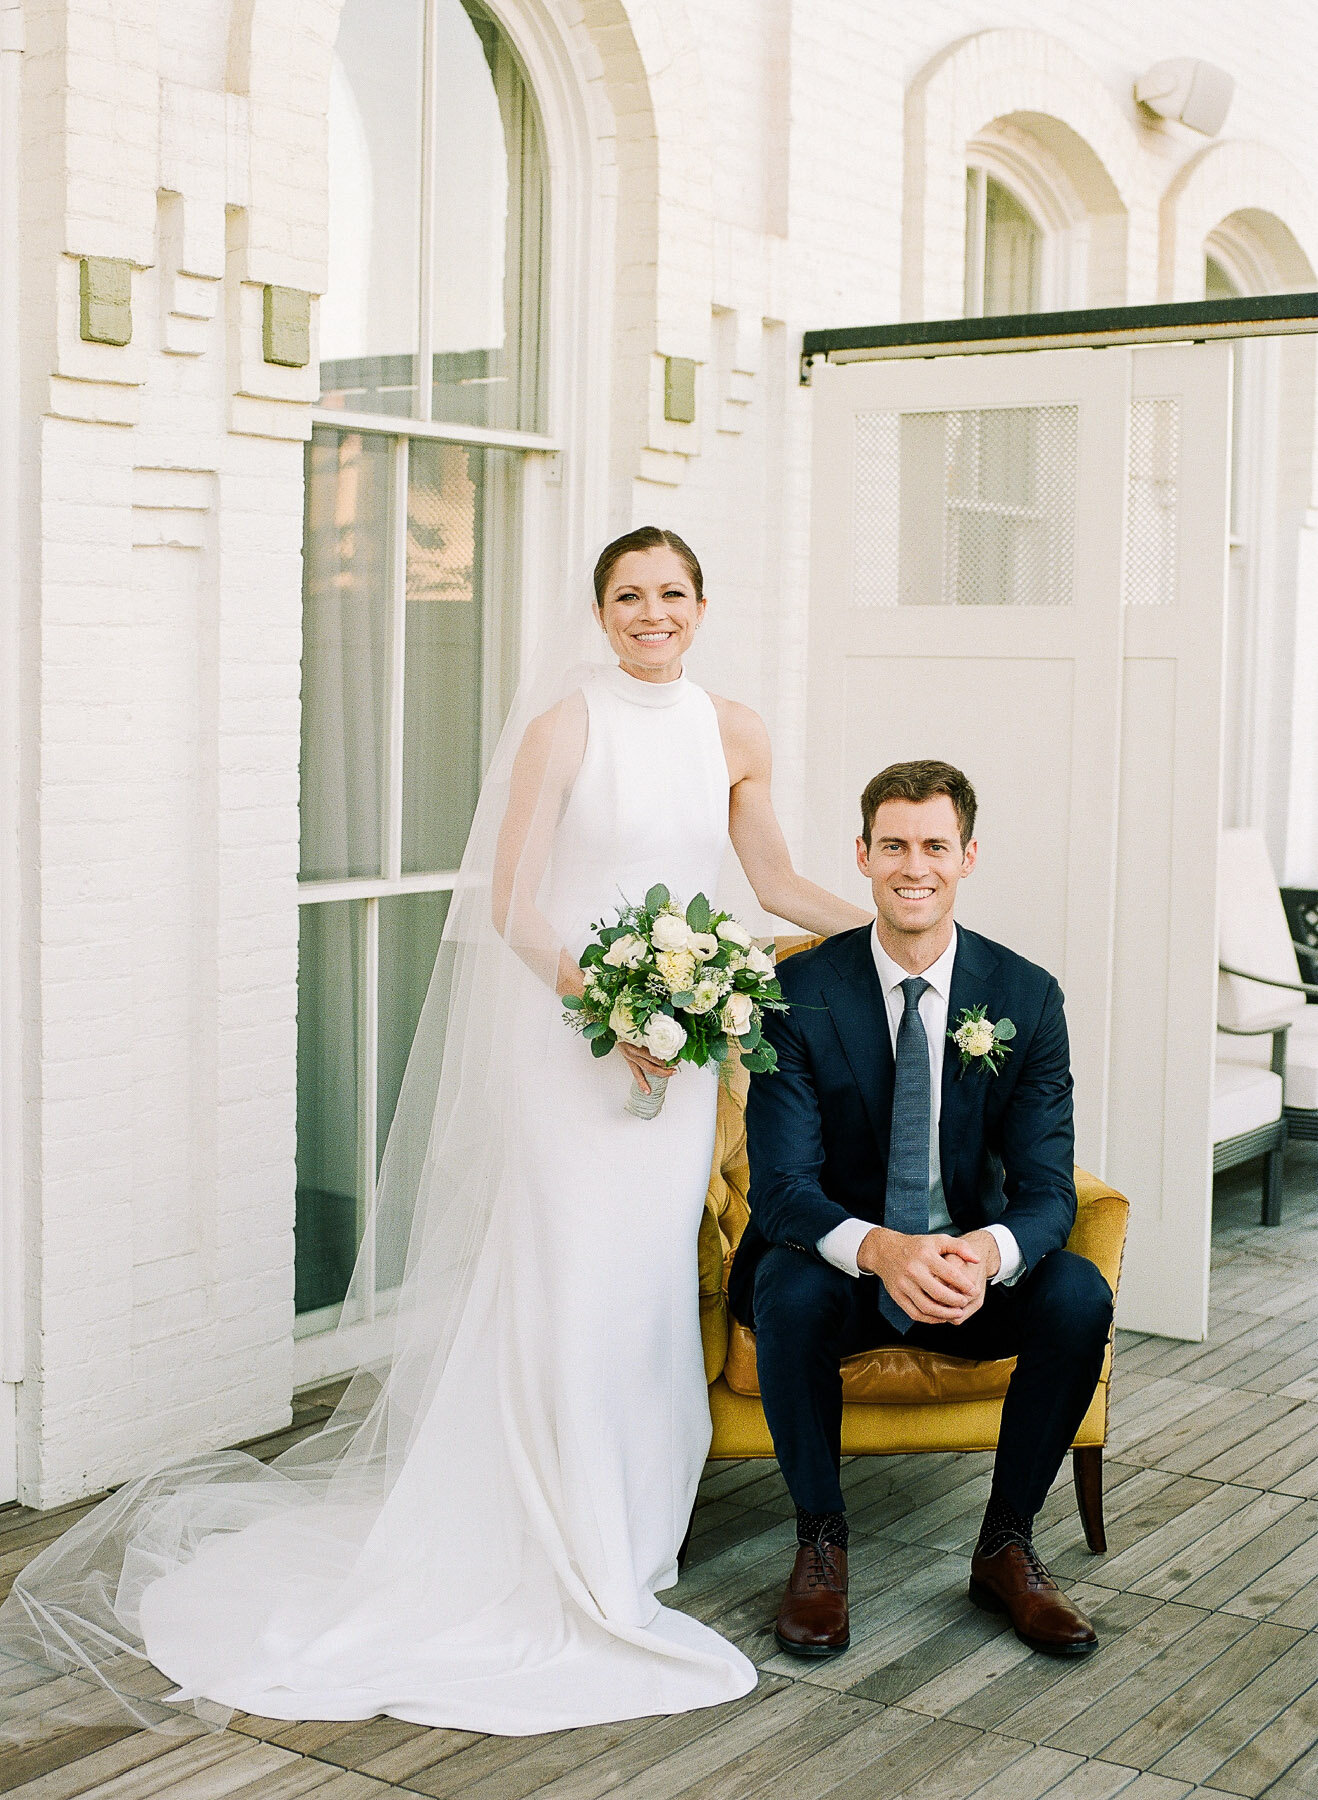 Adelphi Saratoga Wedding by Michelle Lange Photography-31.jpg